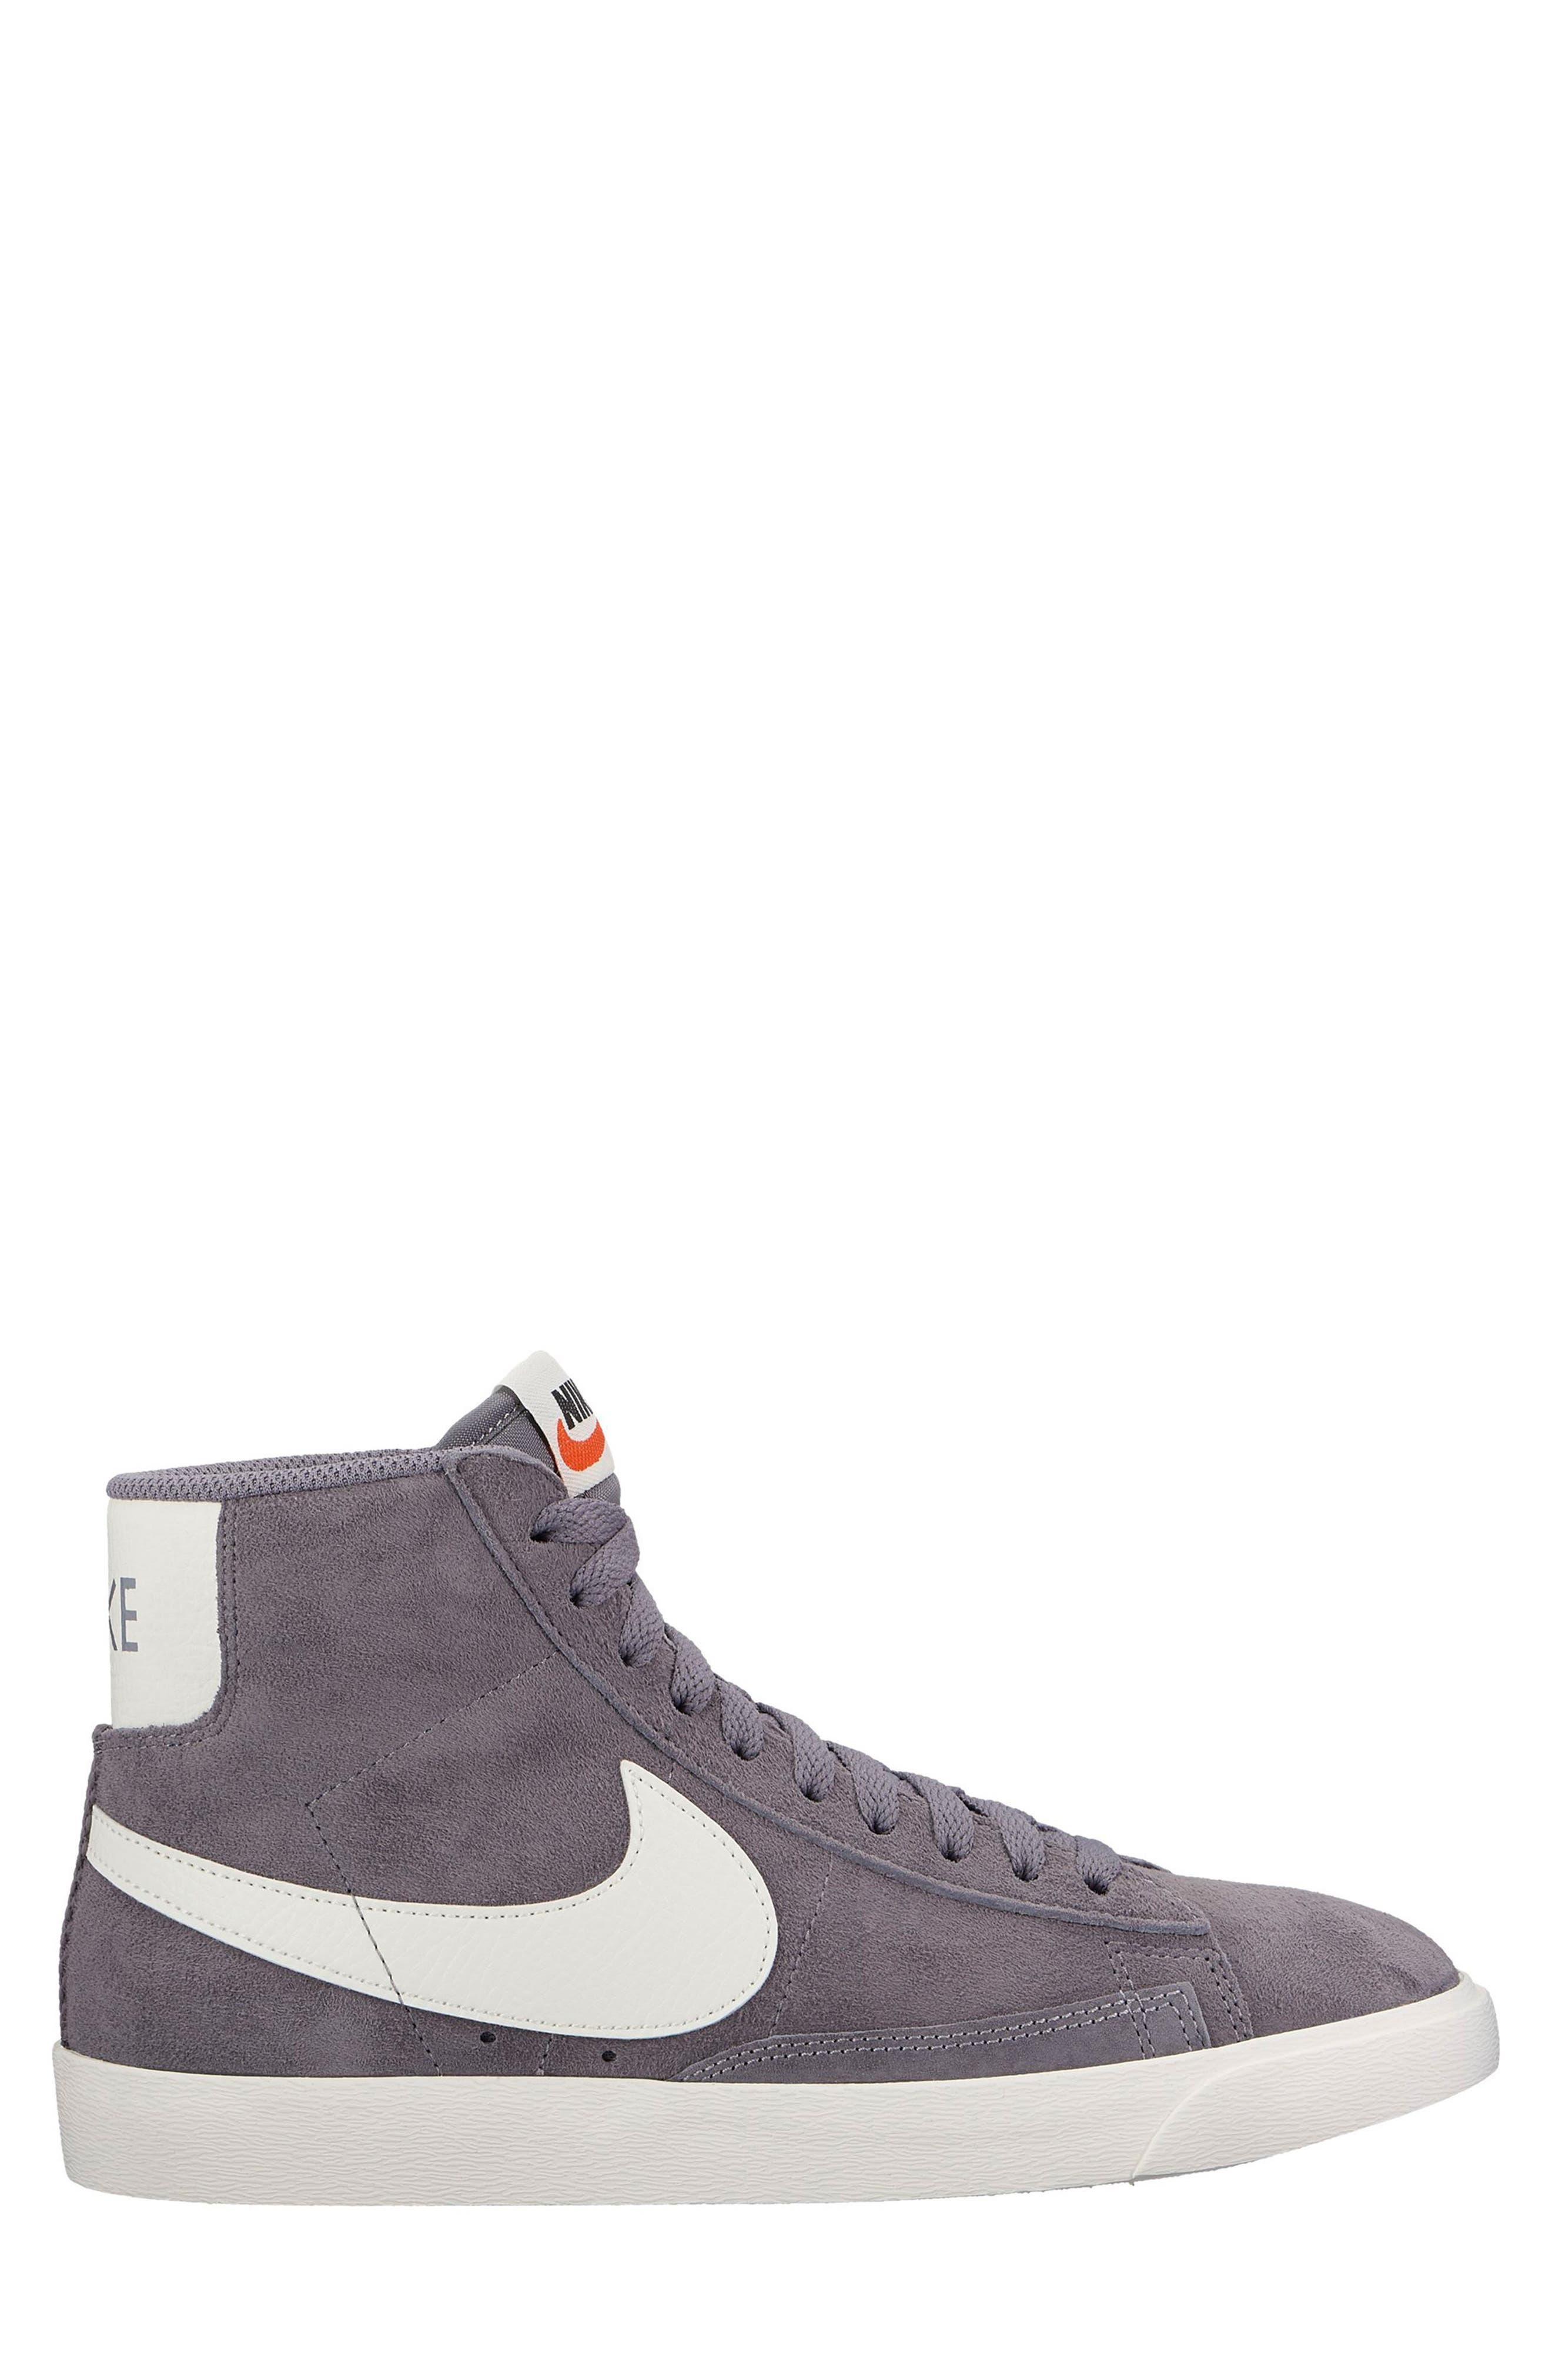 Modesens Blazer Nike Smoke In Sail Sneaker Mid Top 0Sq7v